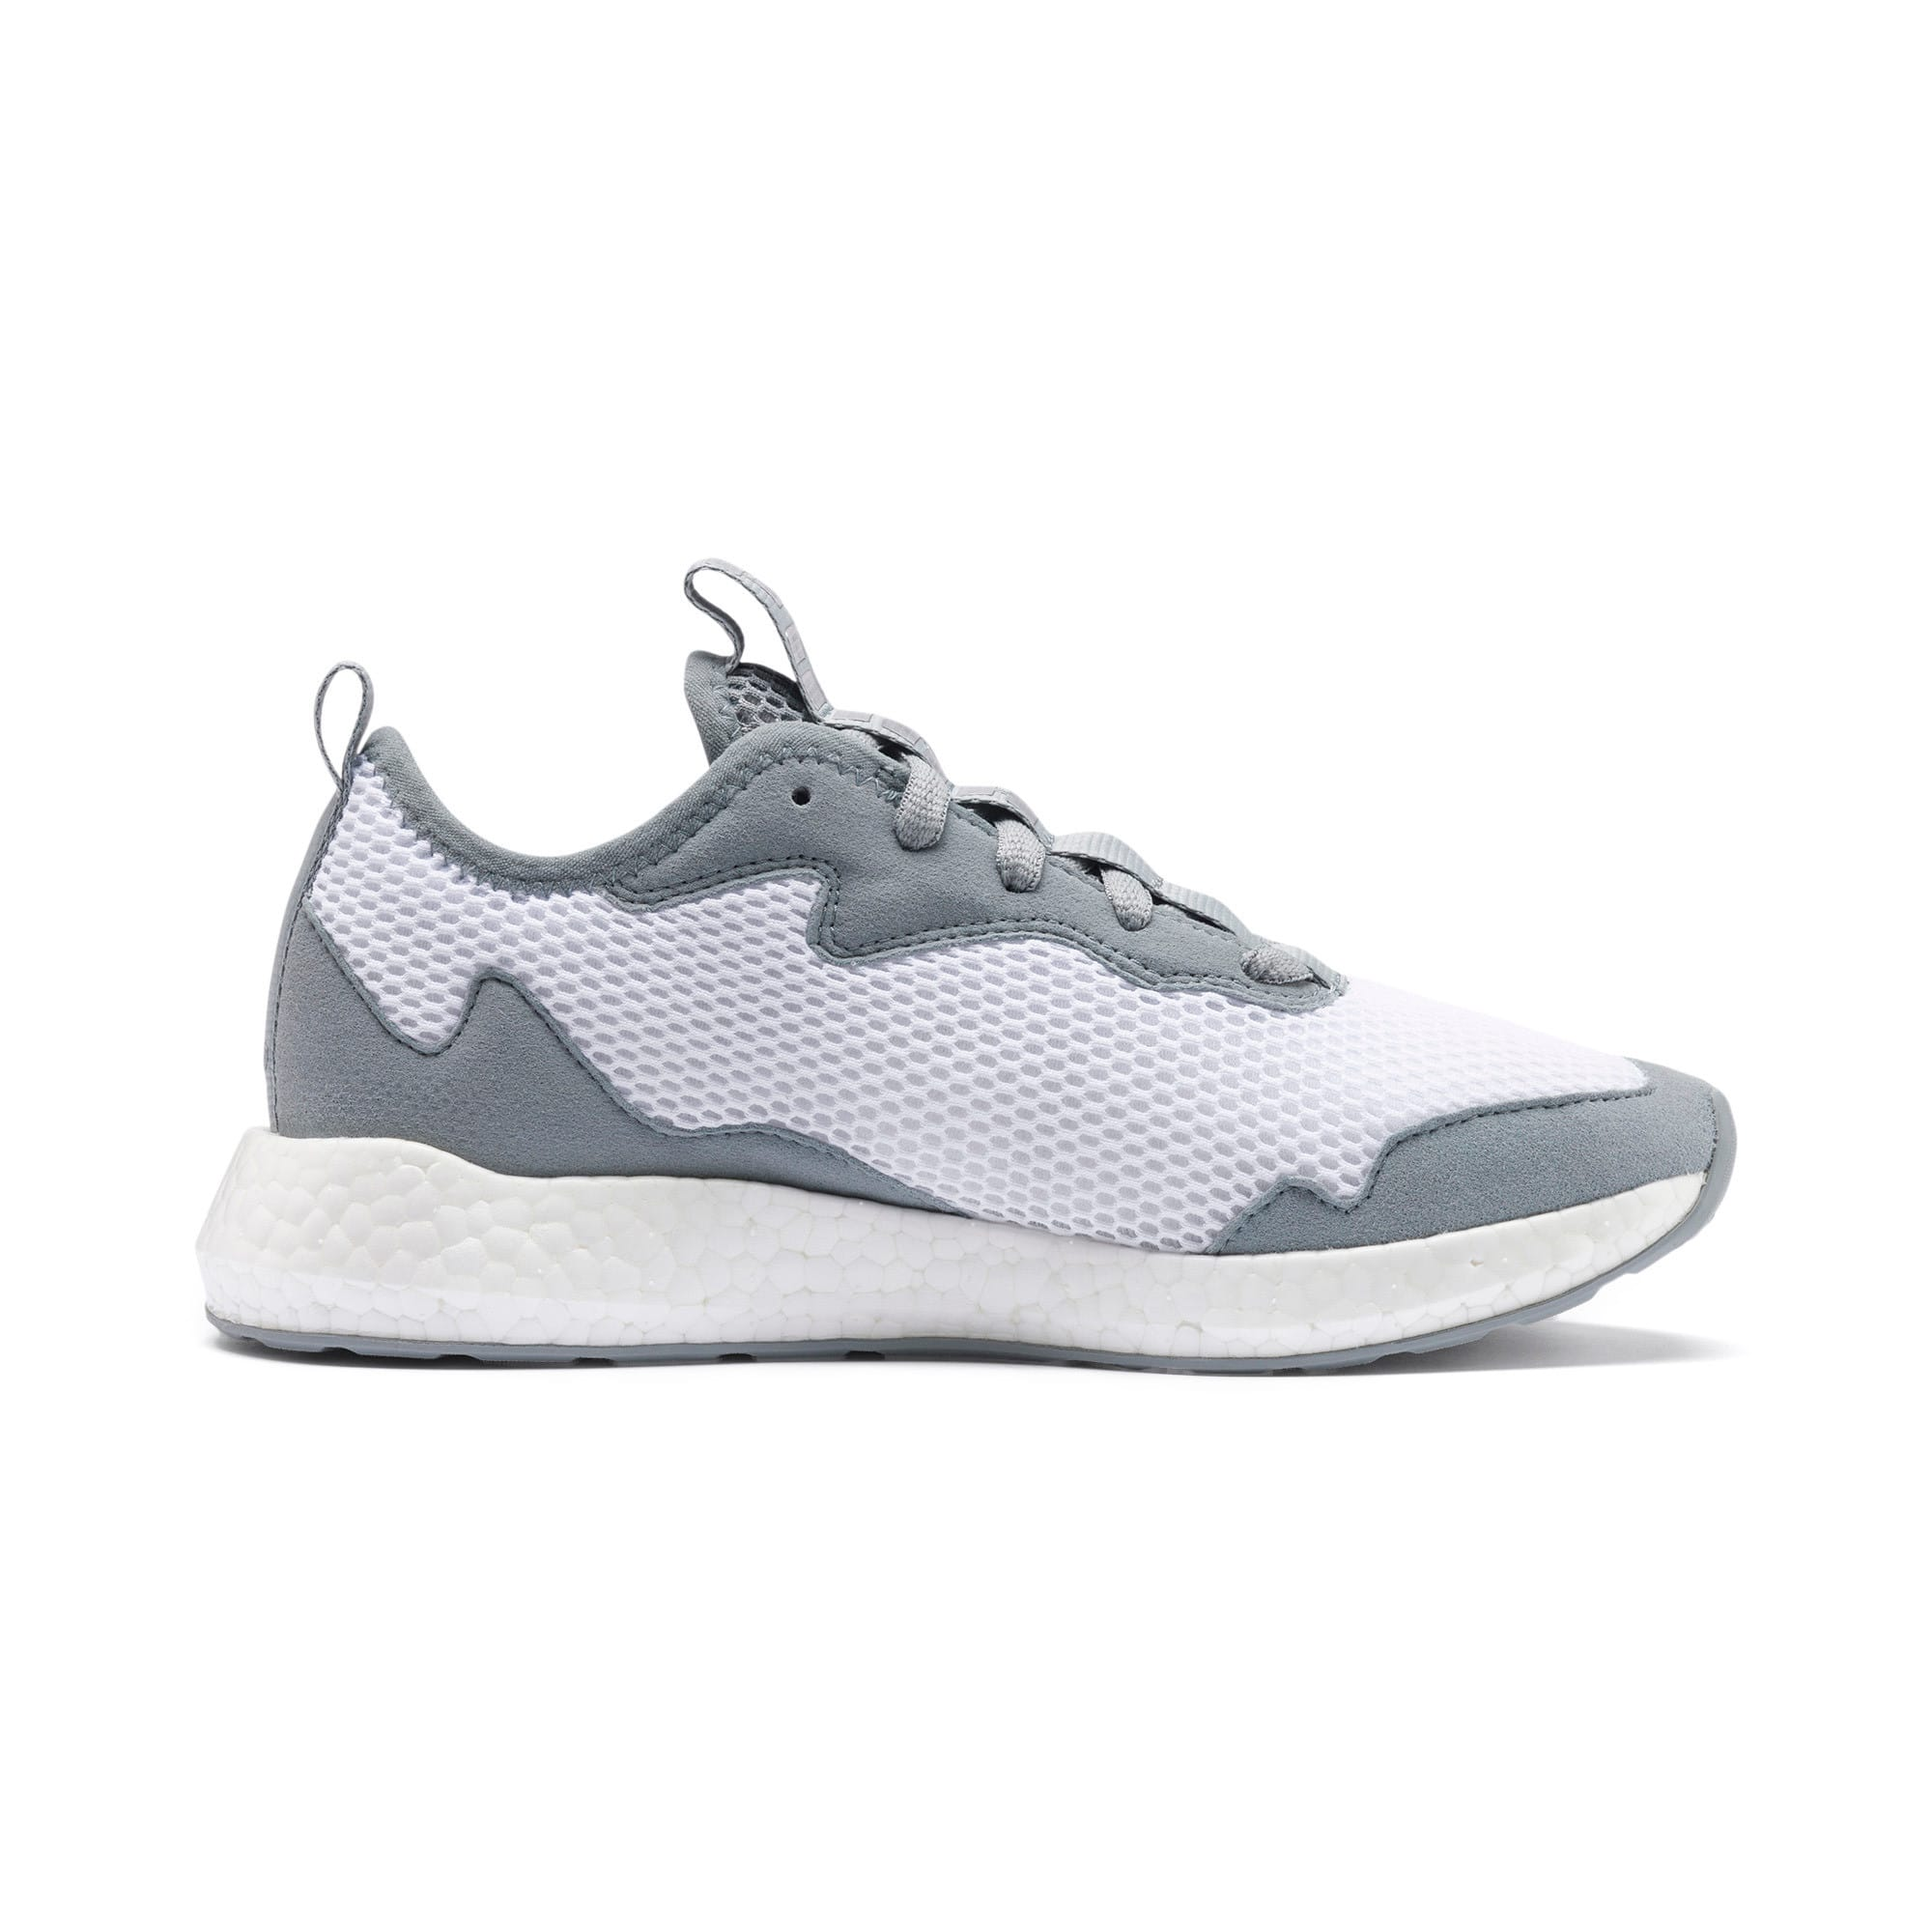 Thumbnail 6 of NRGY Neko Skim Women's Running Shoes, Puma White-Quarry, medium